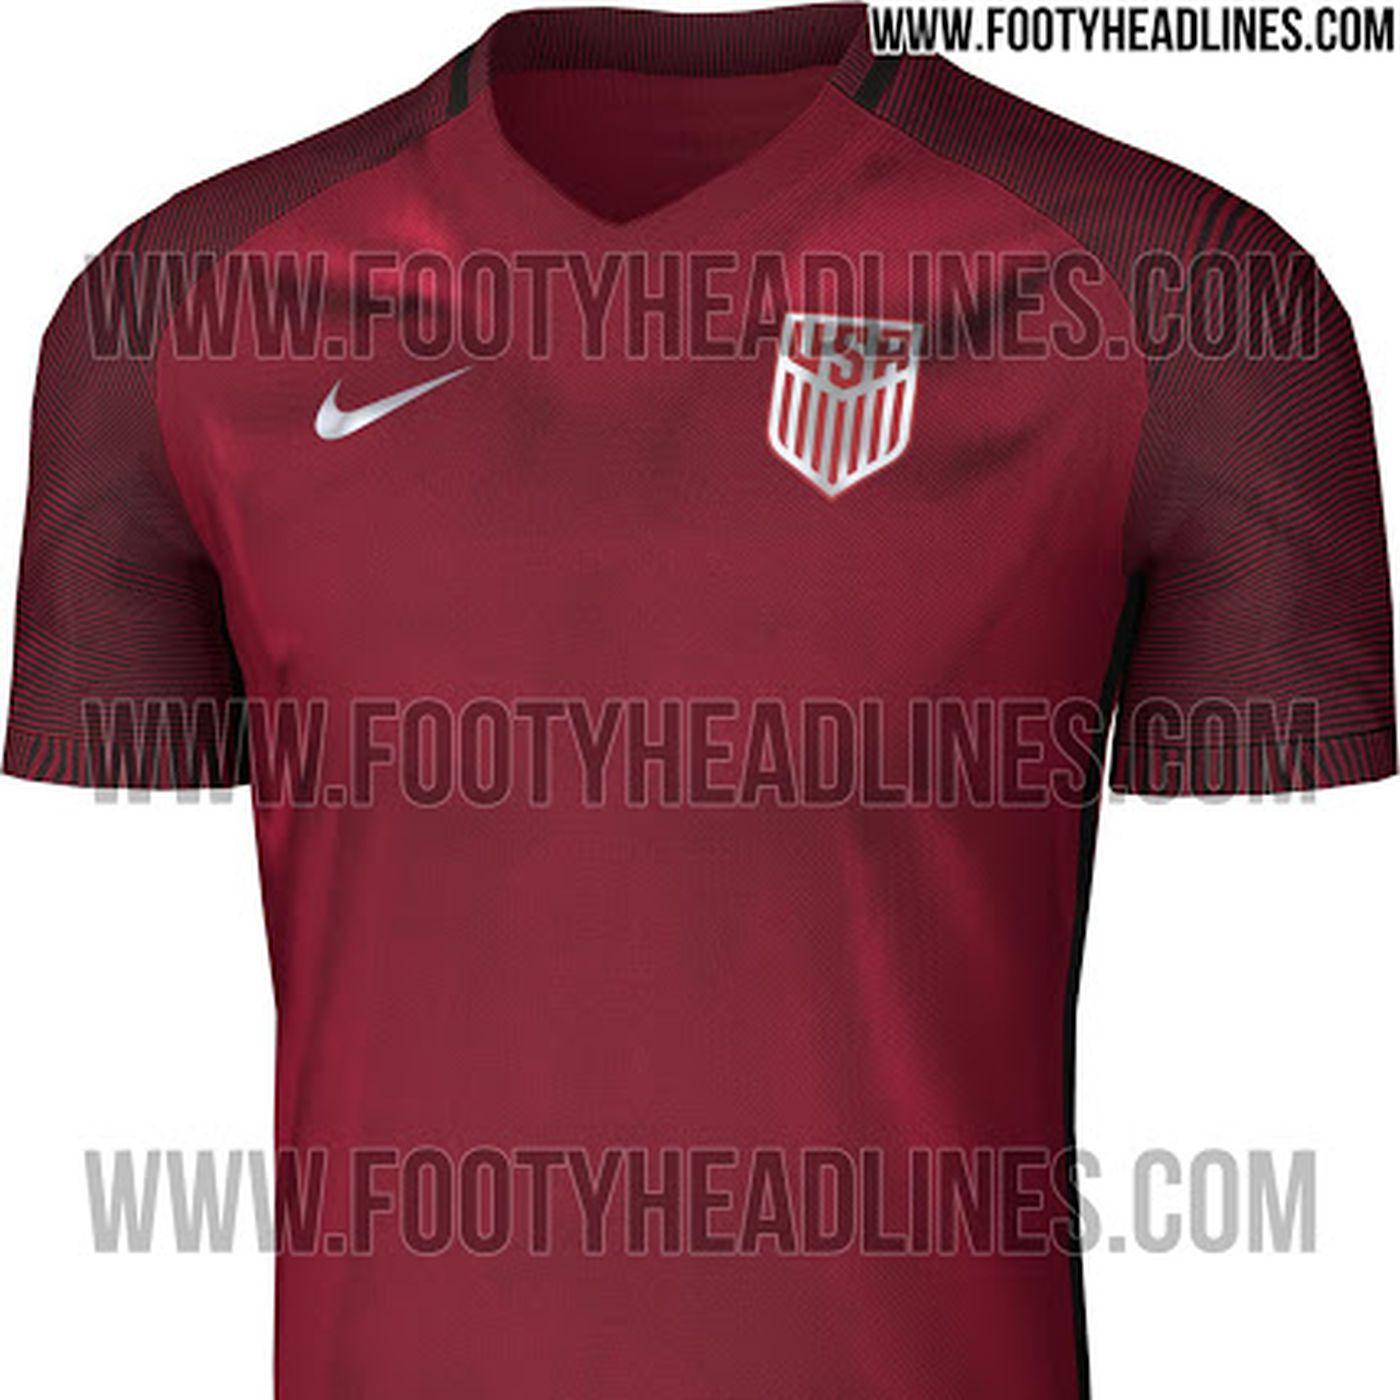 release date 5c119 5b3d5 U.S. Soccer 2017 Third Kit Leaks - Stars and Stripes FC